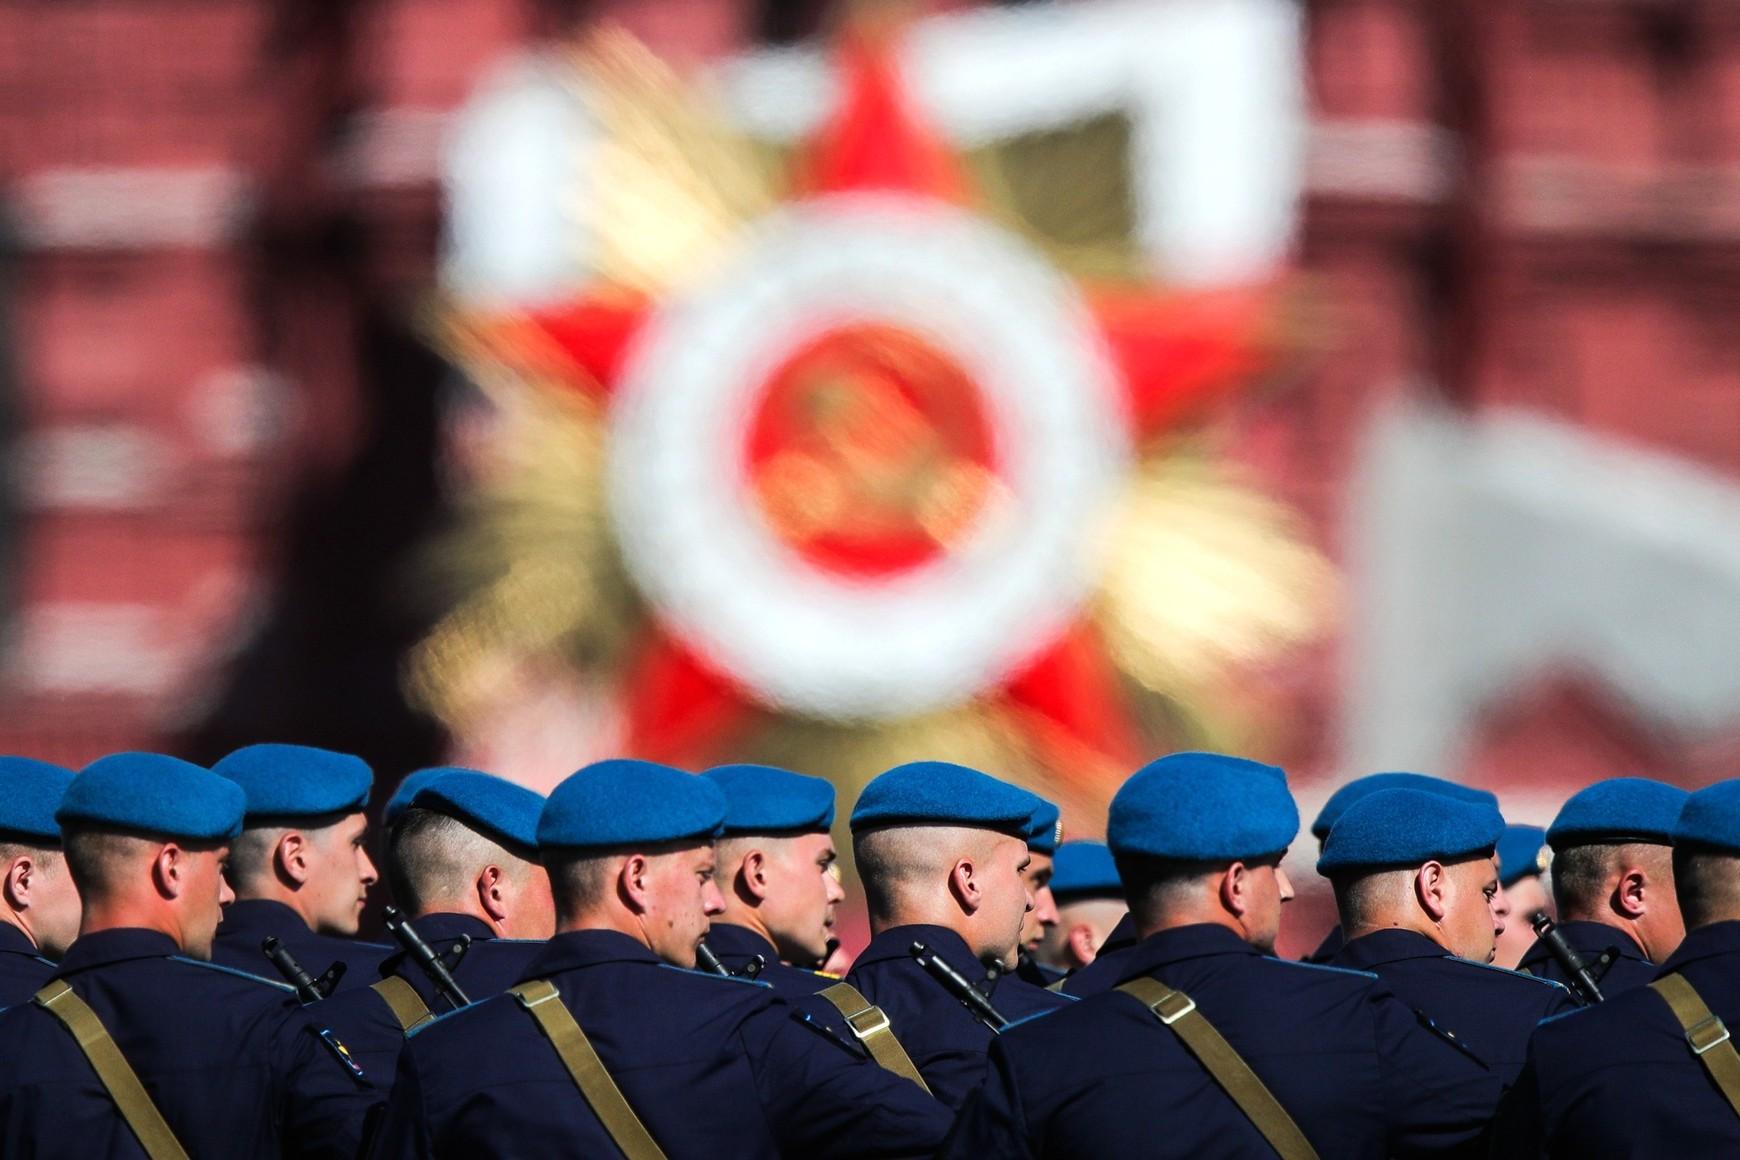 Detalj sa vojne parade povodom Dana pobede u Drugom svetskom ratu, Moskva, 24. jun 2020. (Foto: TASS/kremlin.ru)